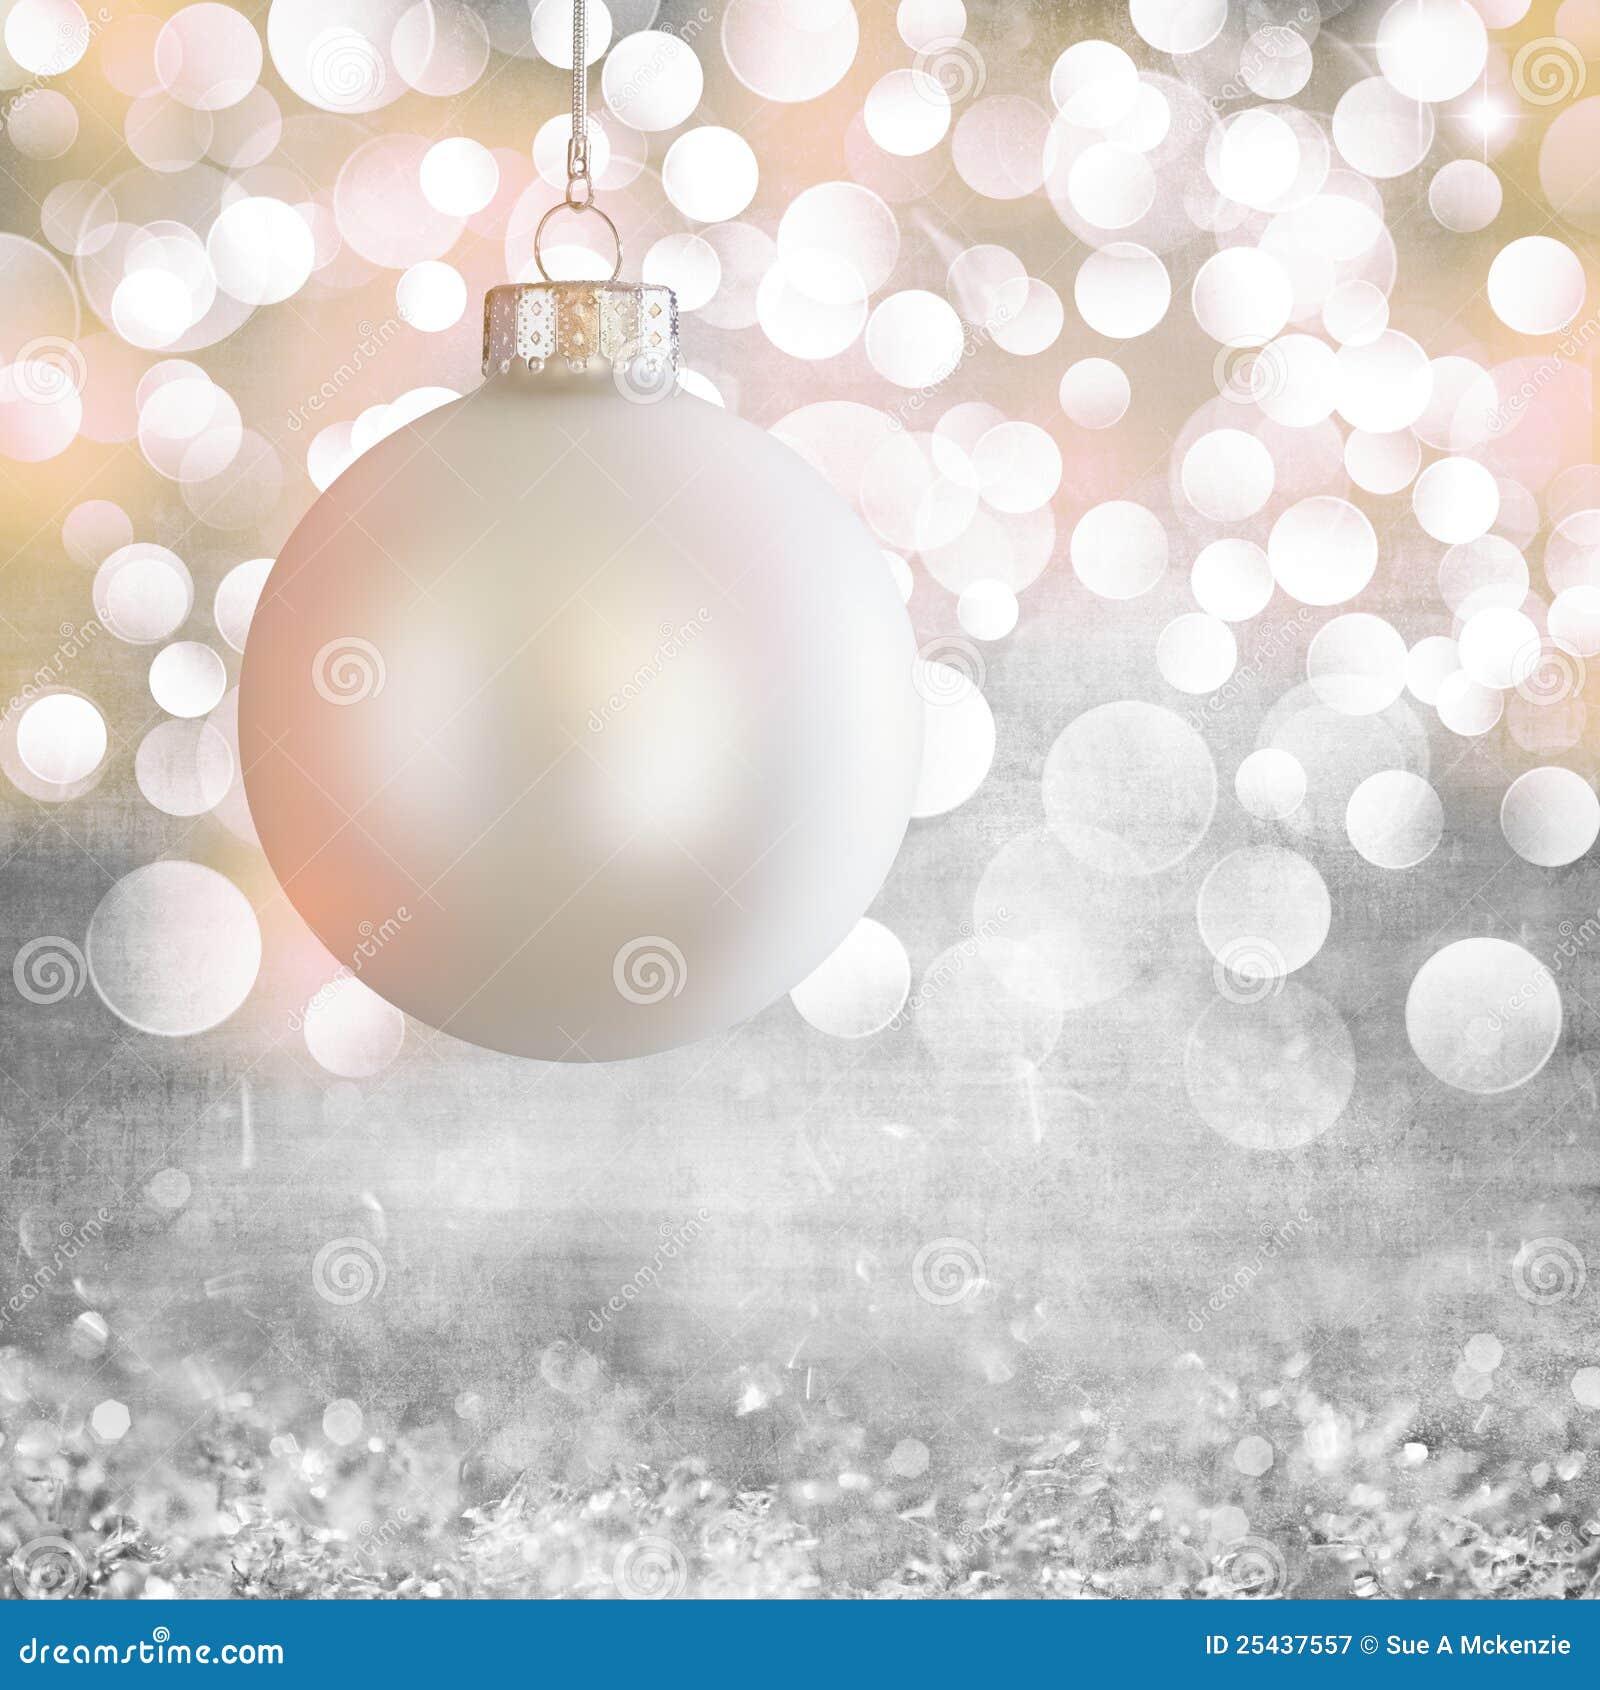 White Vintage Christmas Ornament Over Grey Grunge